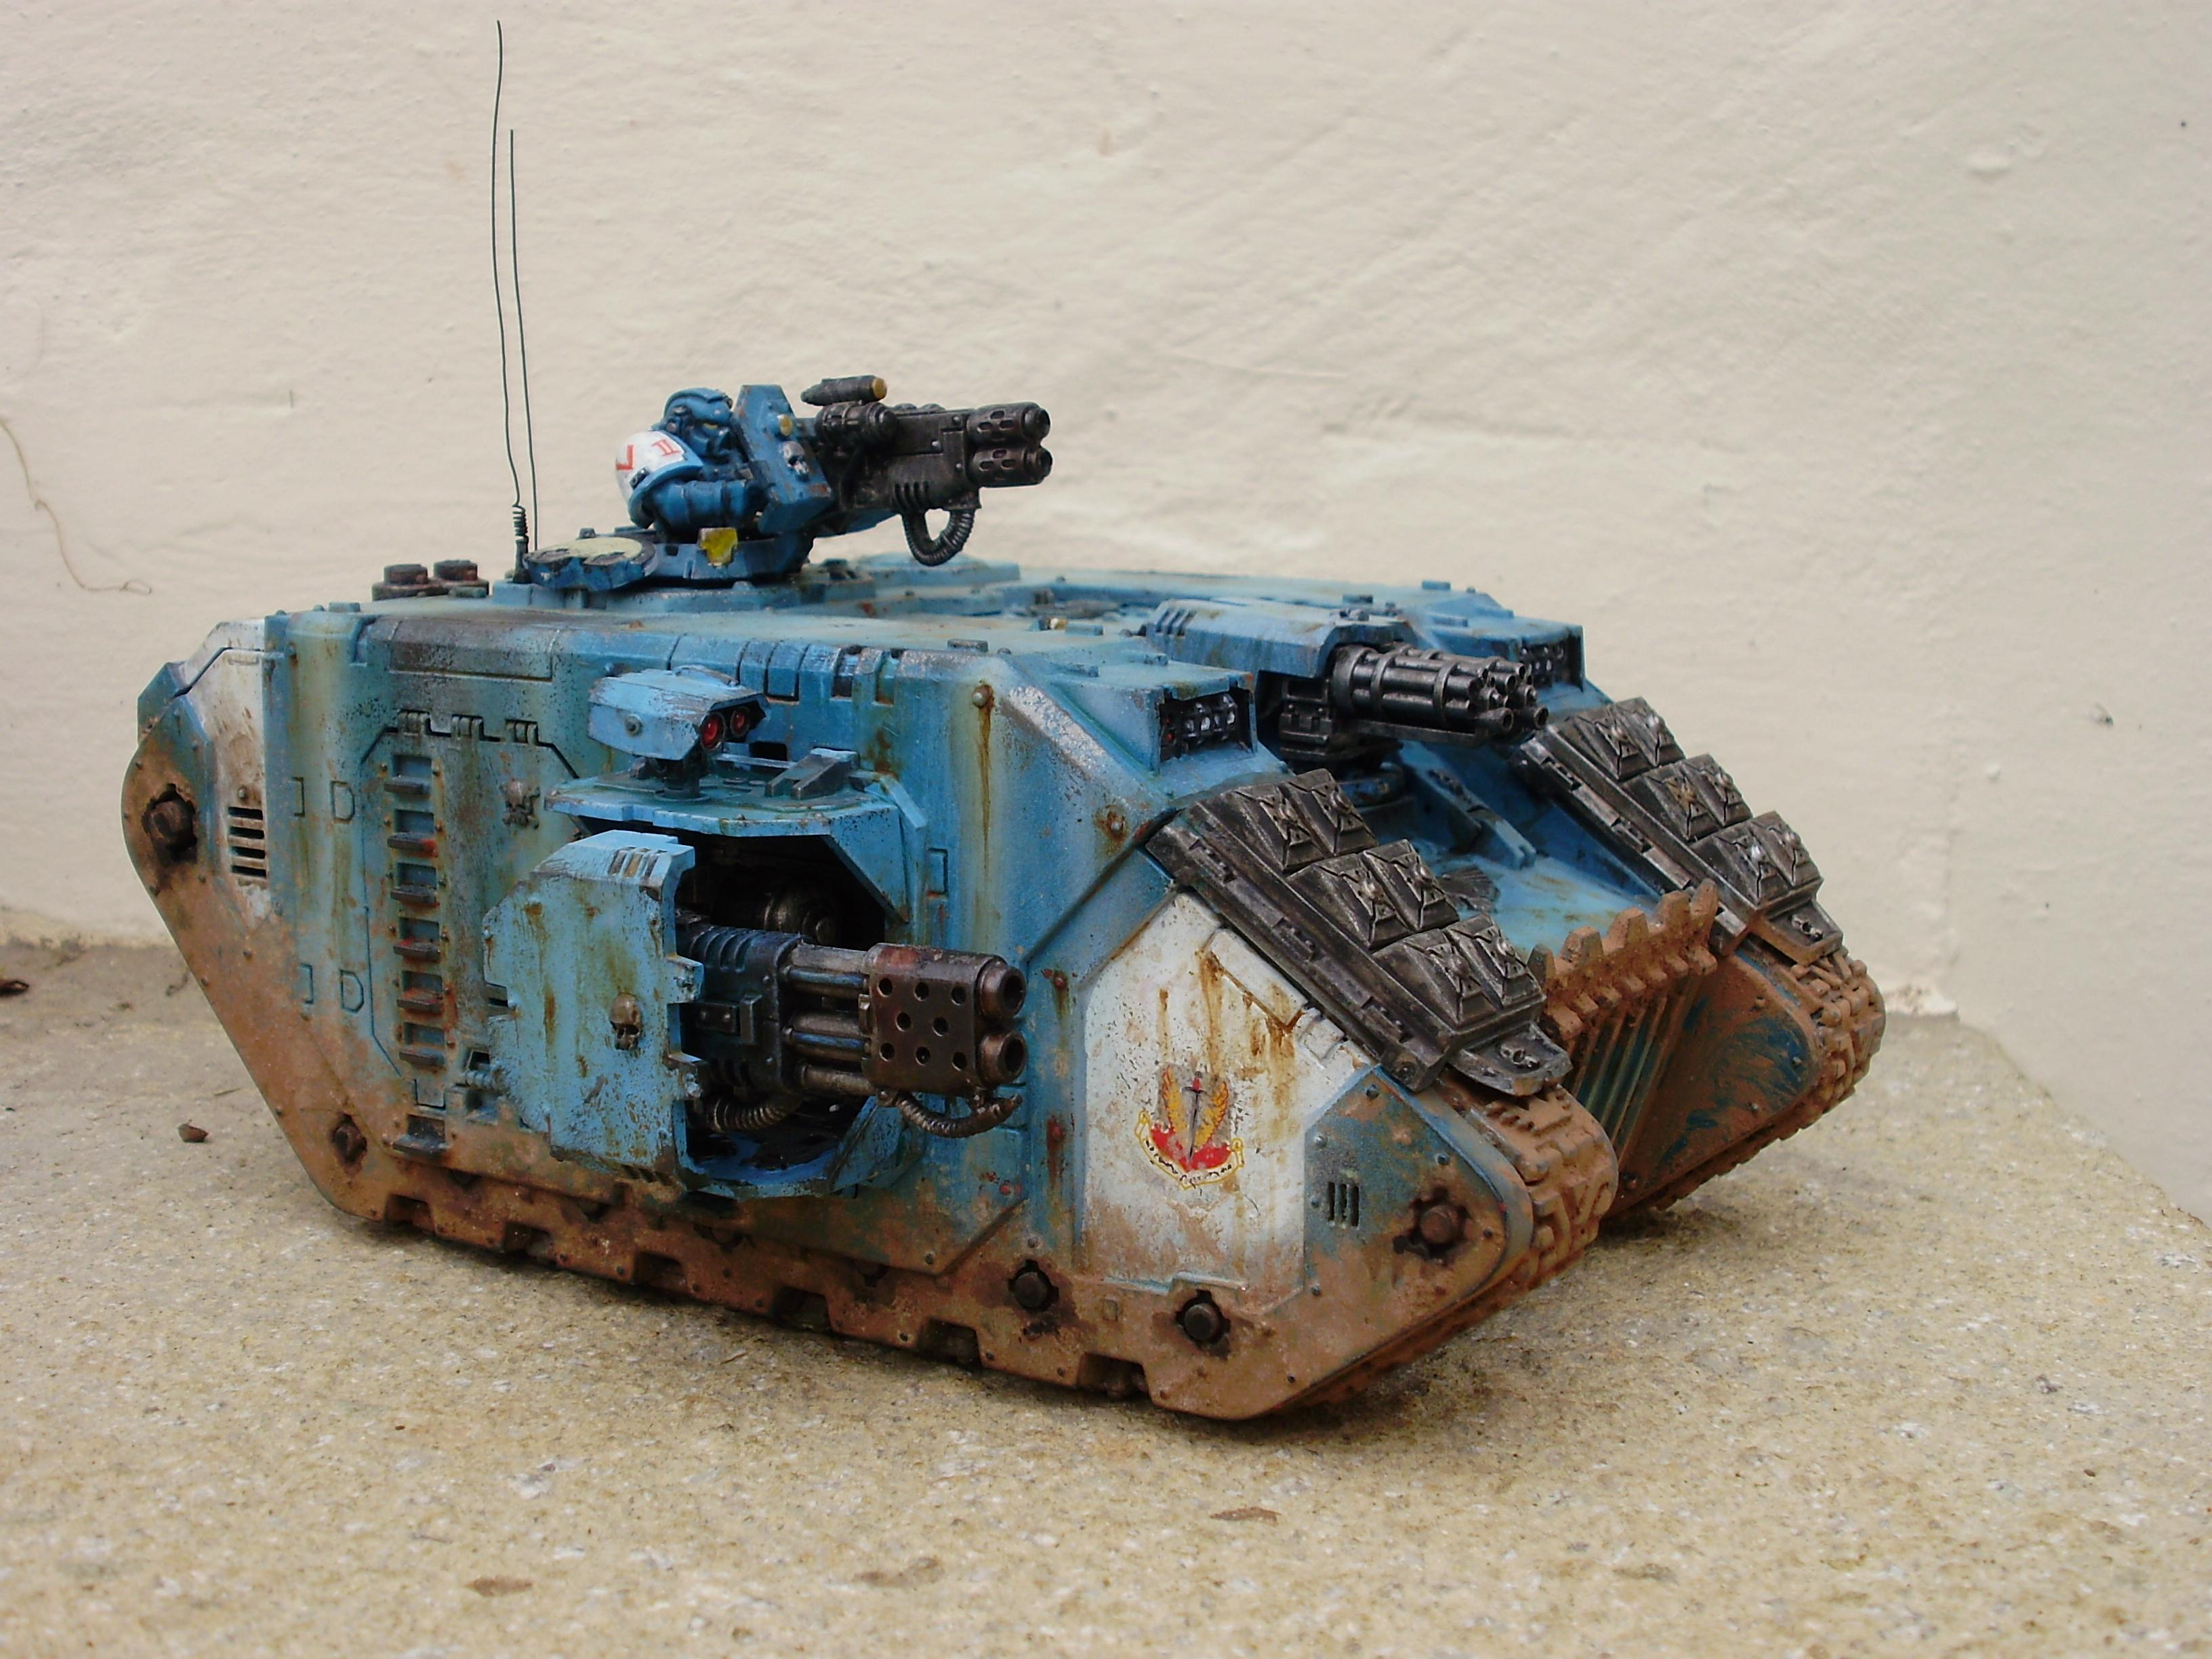 Land Raider, Space Marines, Vehicle, Warhammer 40,000